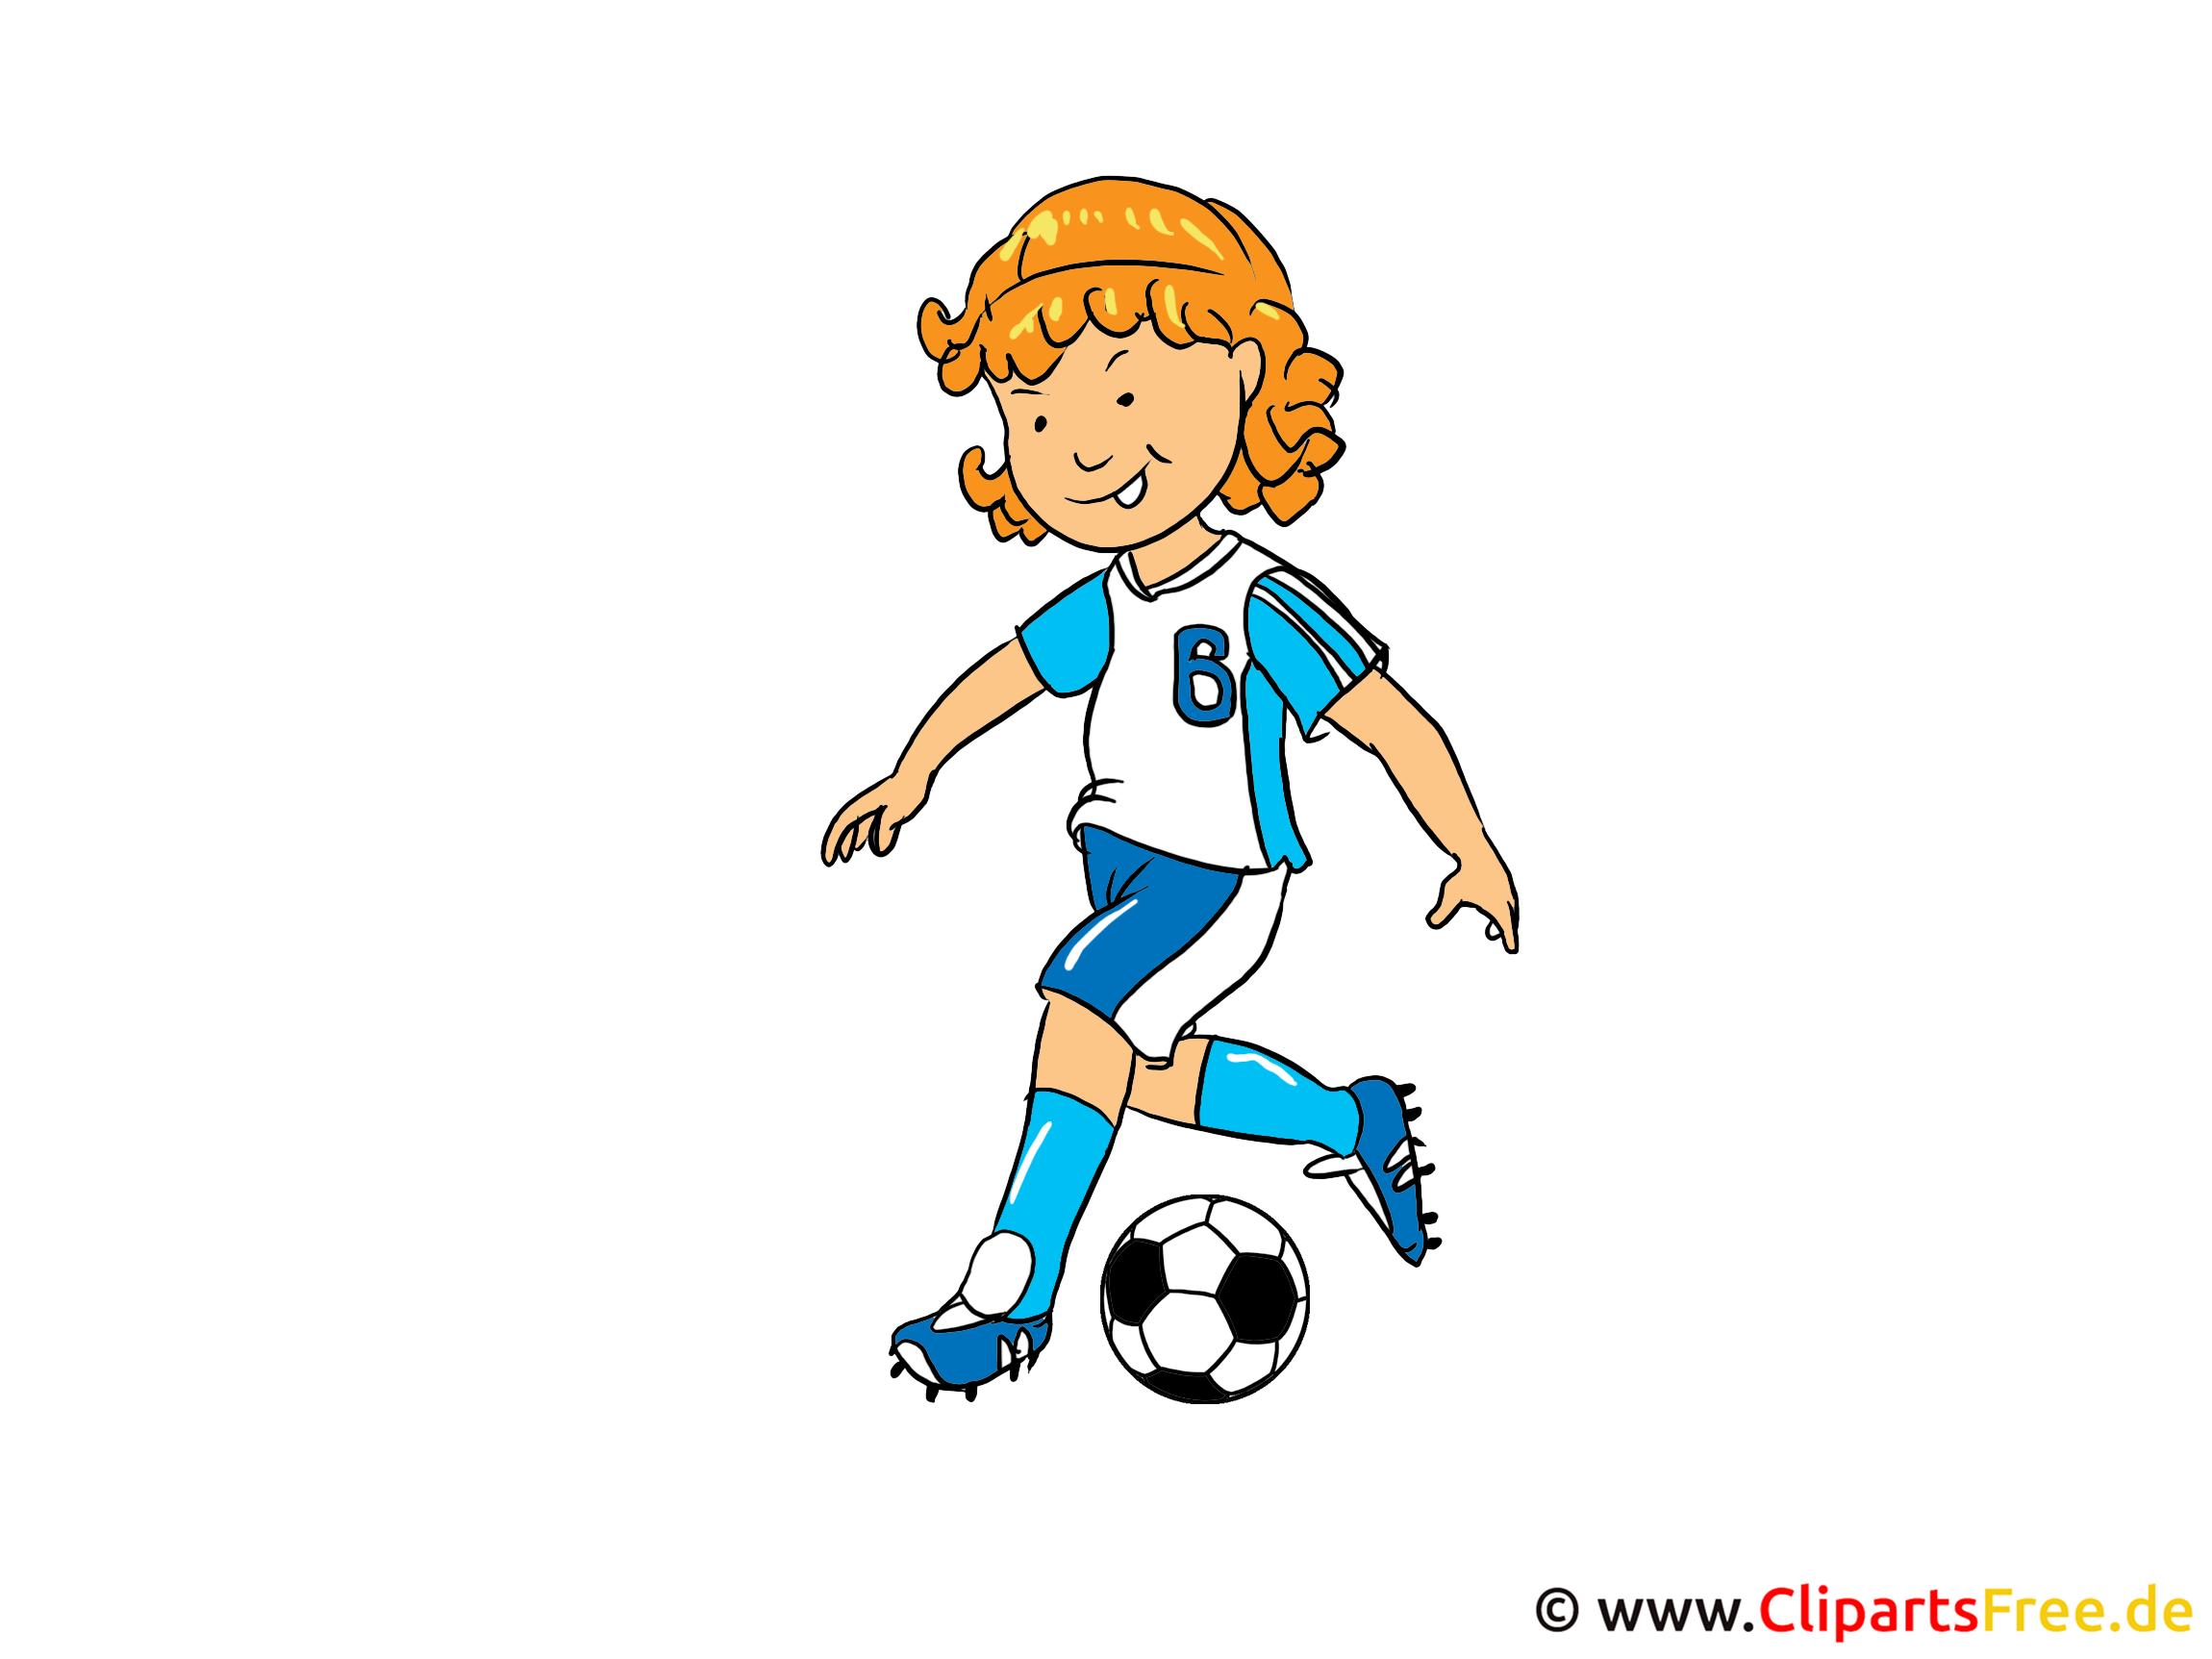 Frauenfußball Bild, Clipart, Illustration